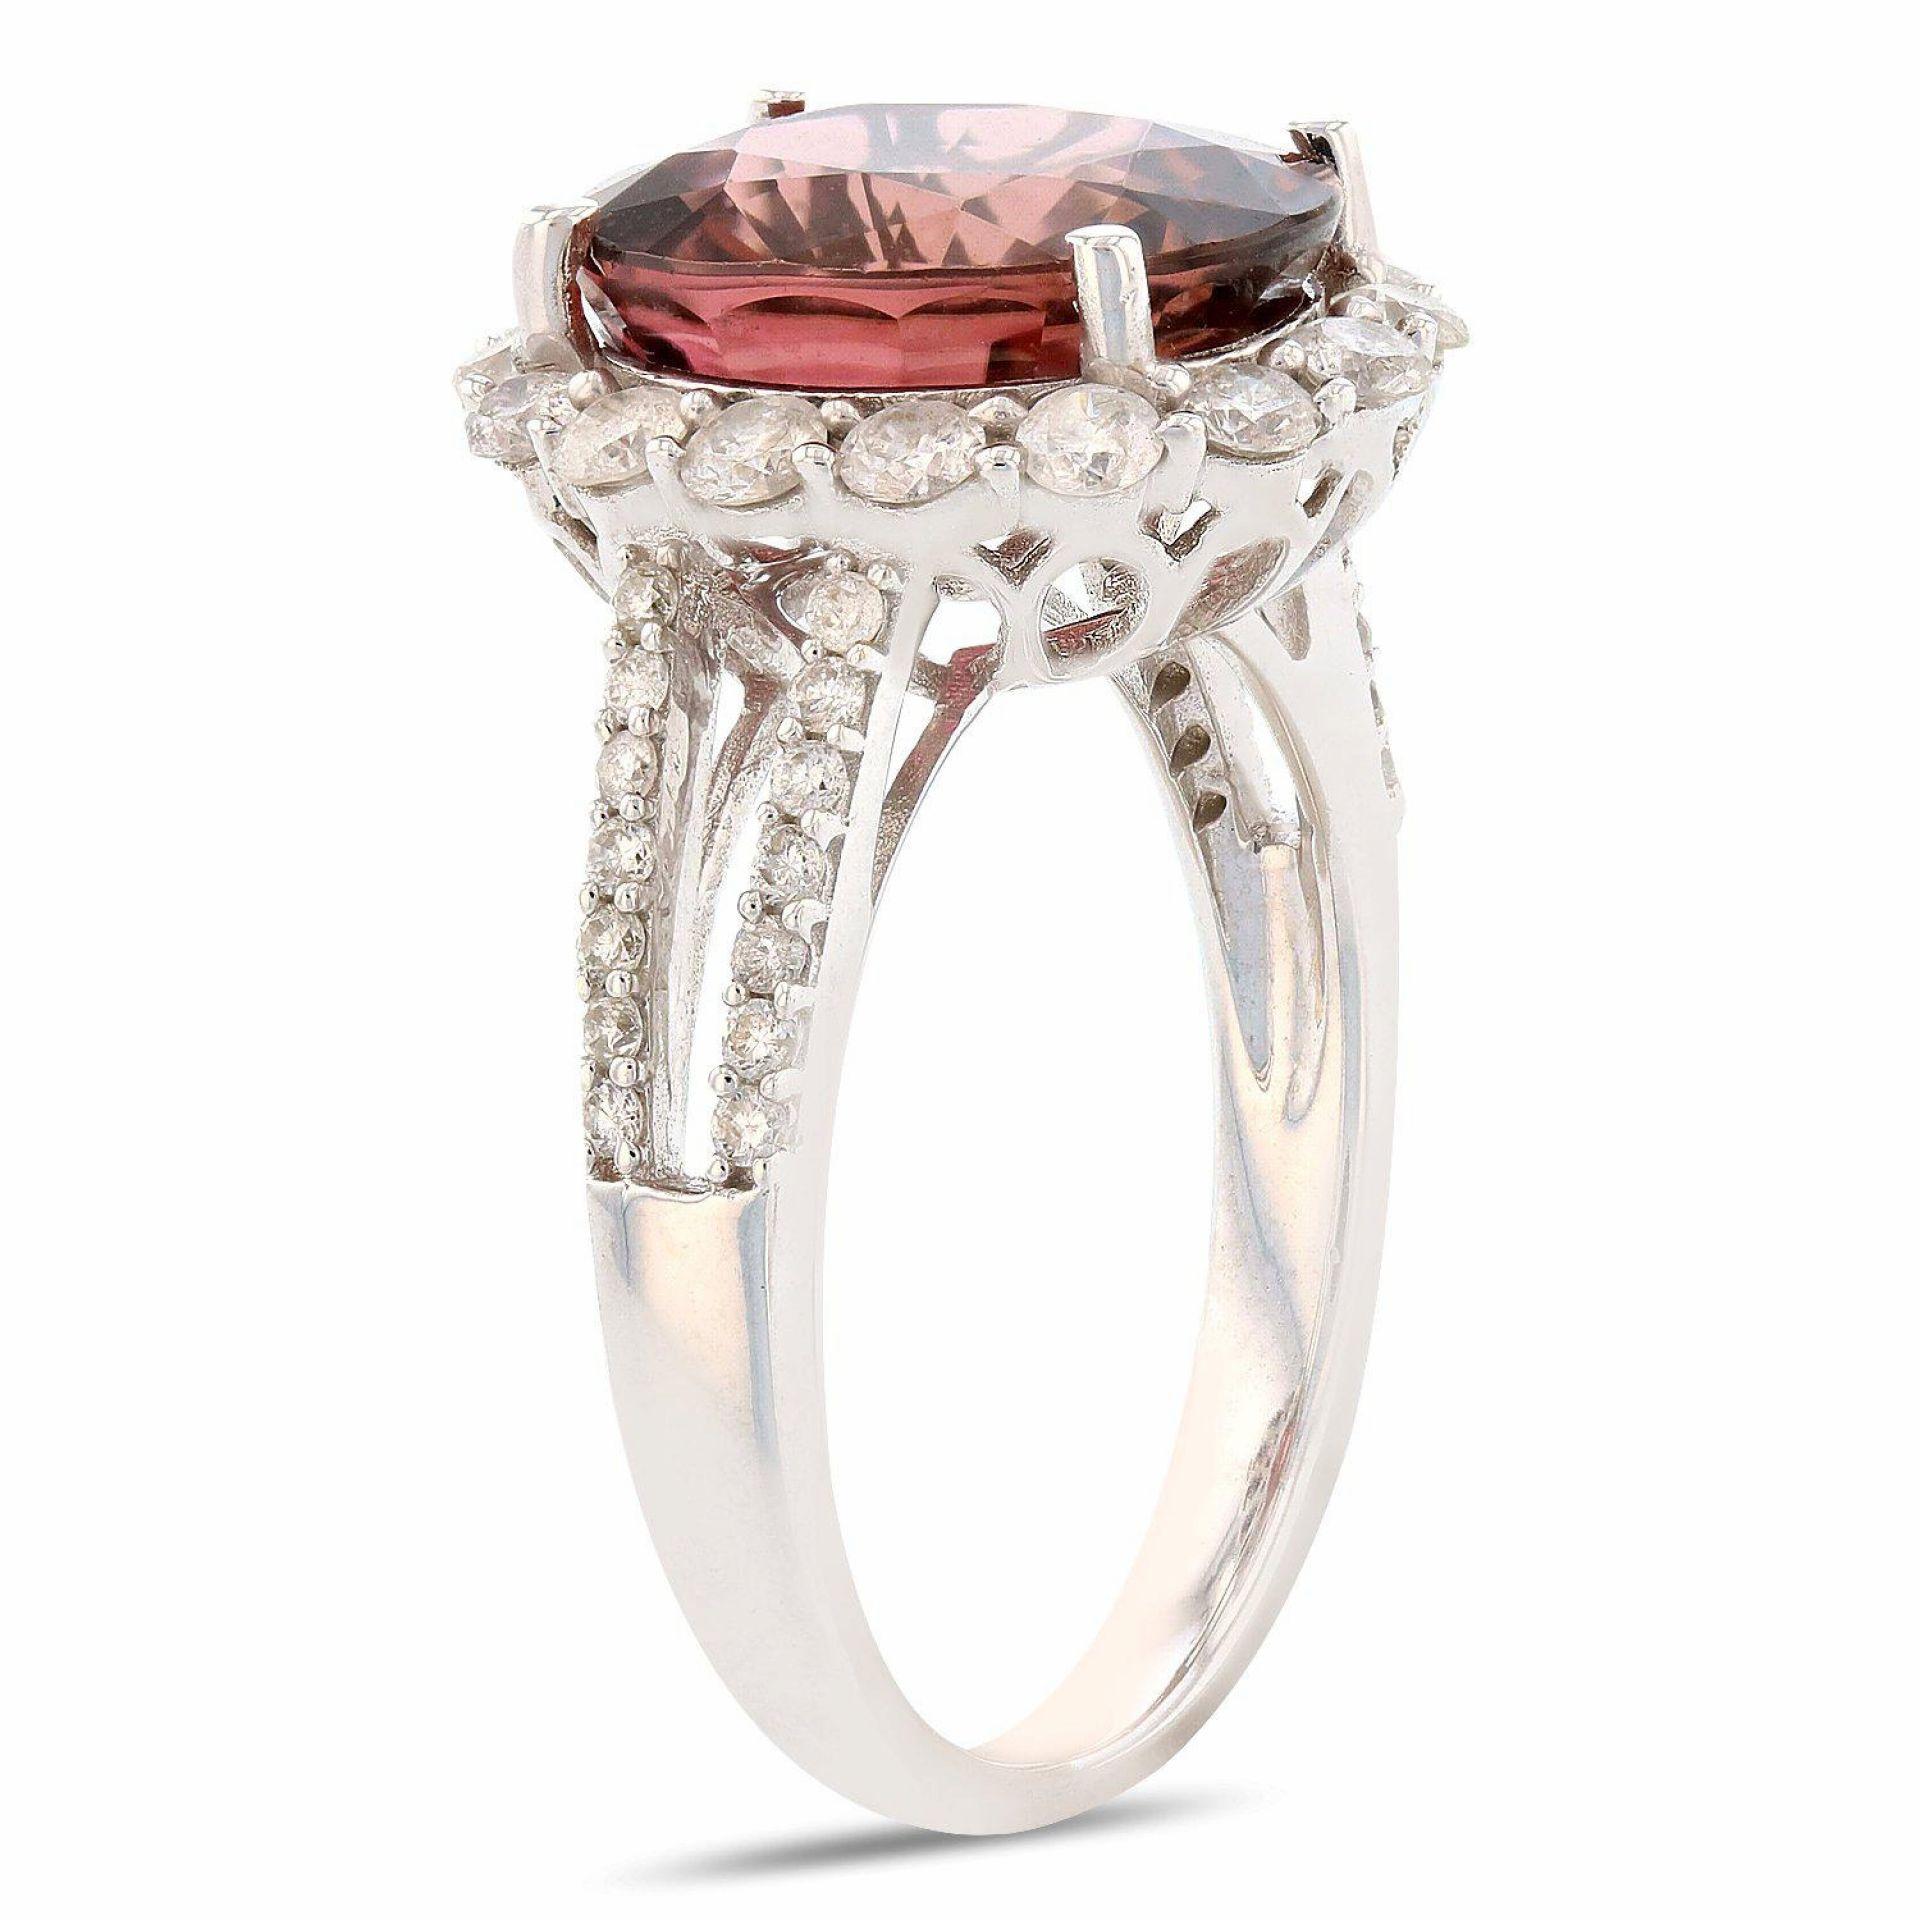 4.98ct Pink Tourmaline and 0.89ctw Diamond 14K White Gold Ring